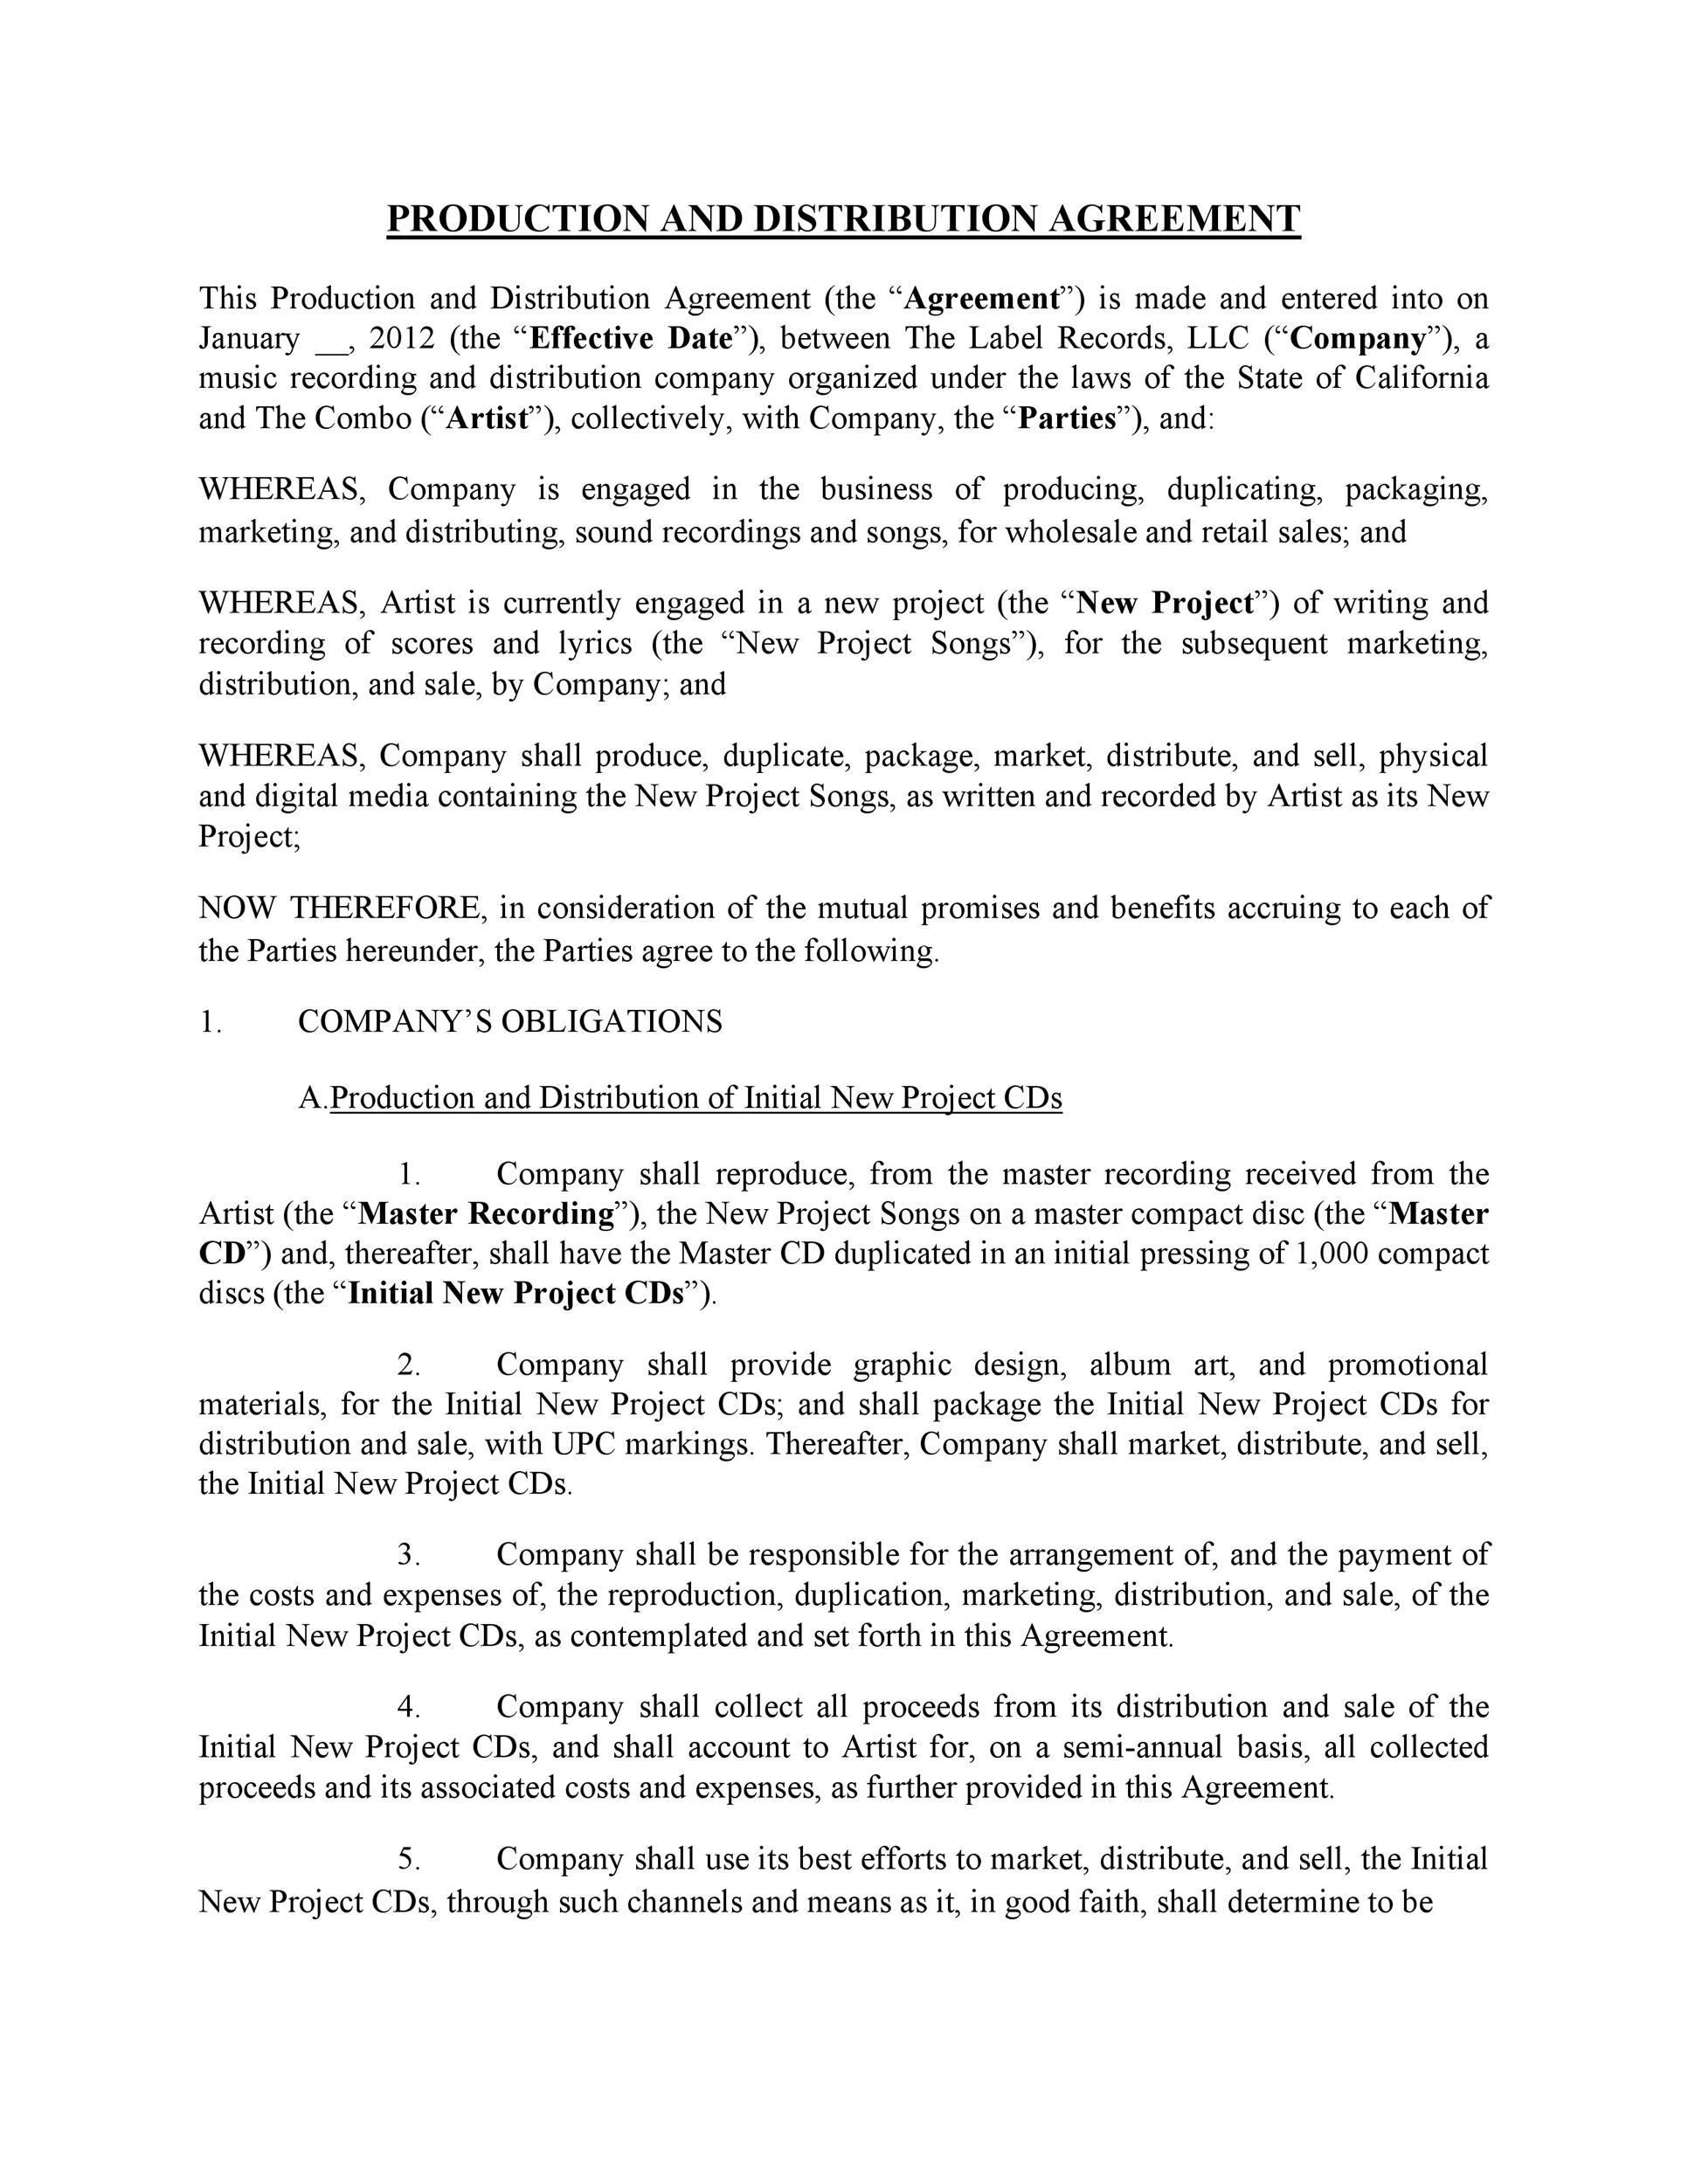 Free distribution agreement 24